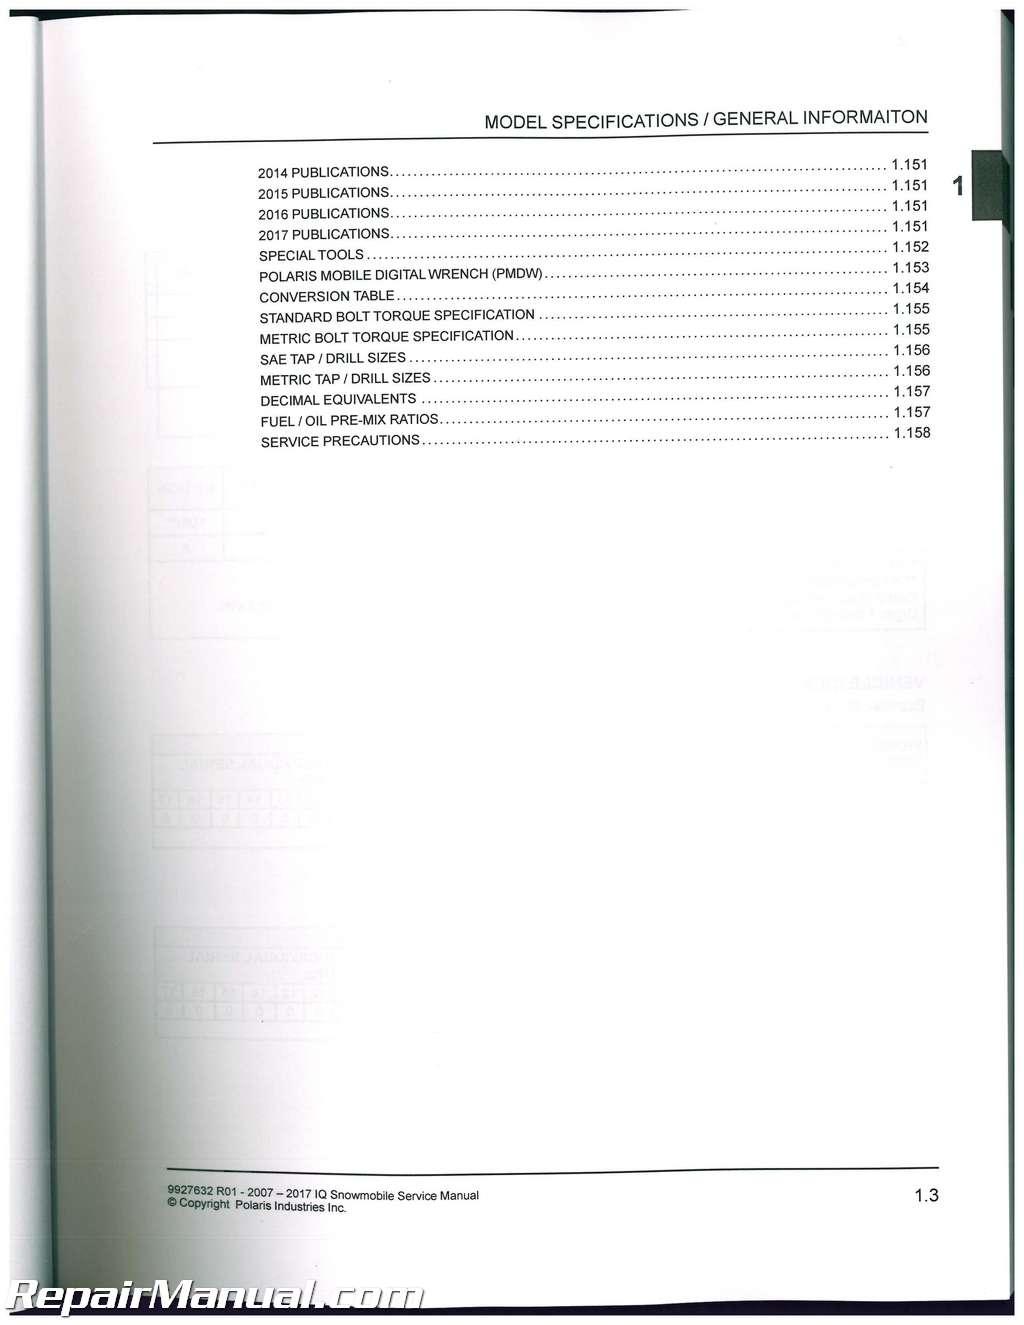 2009 polaris dragon 800 service manual